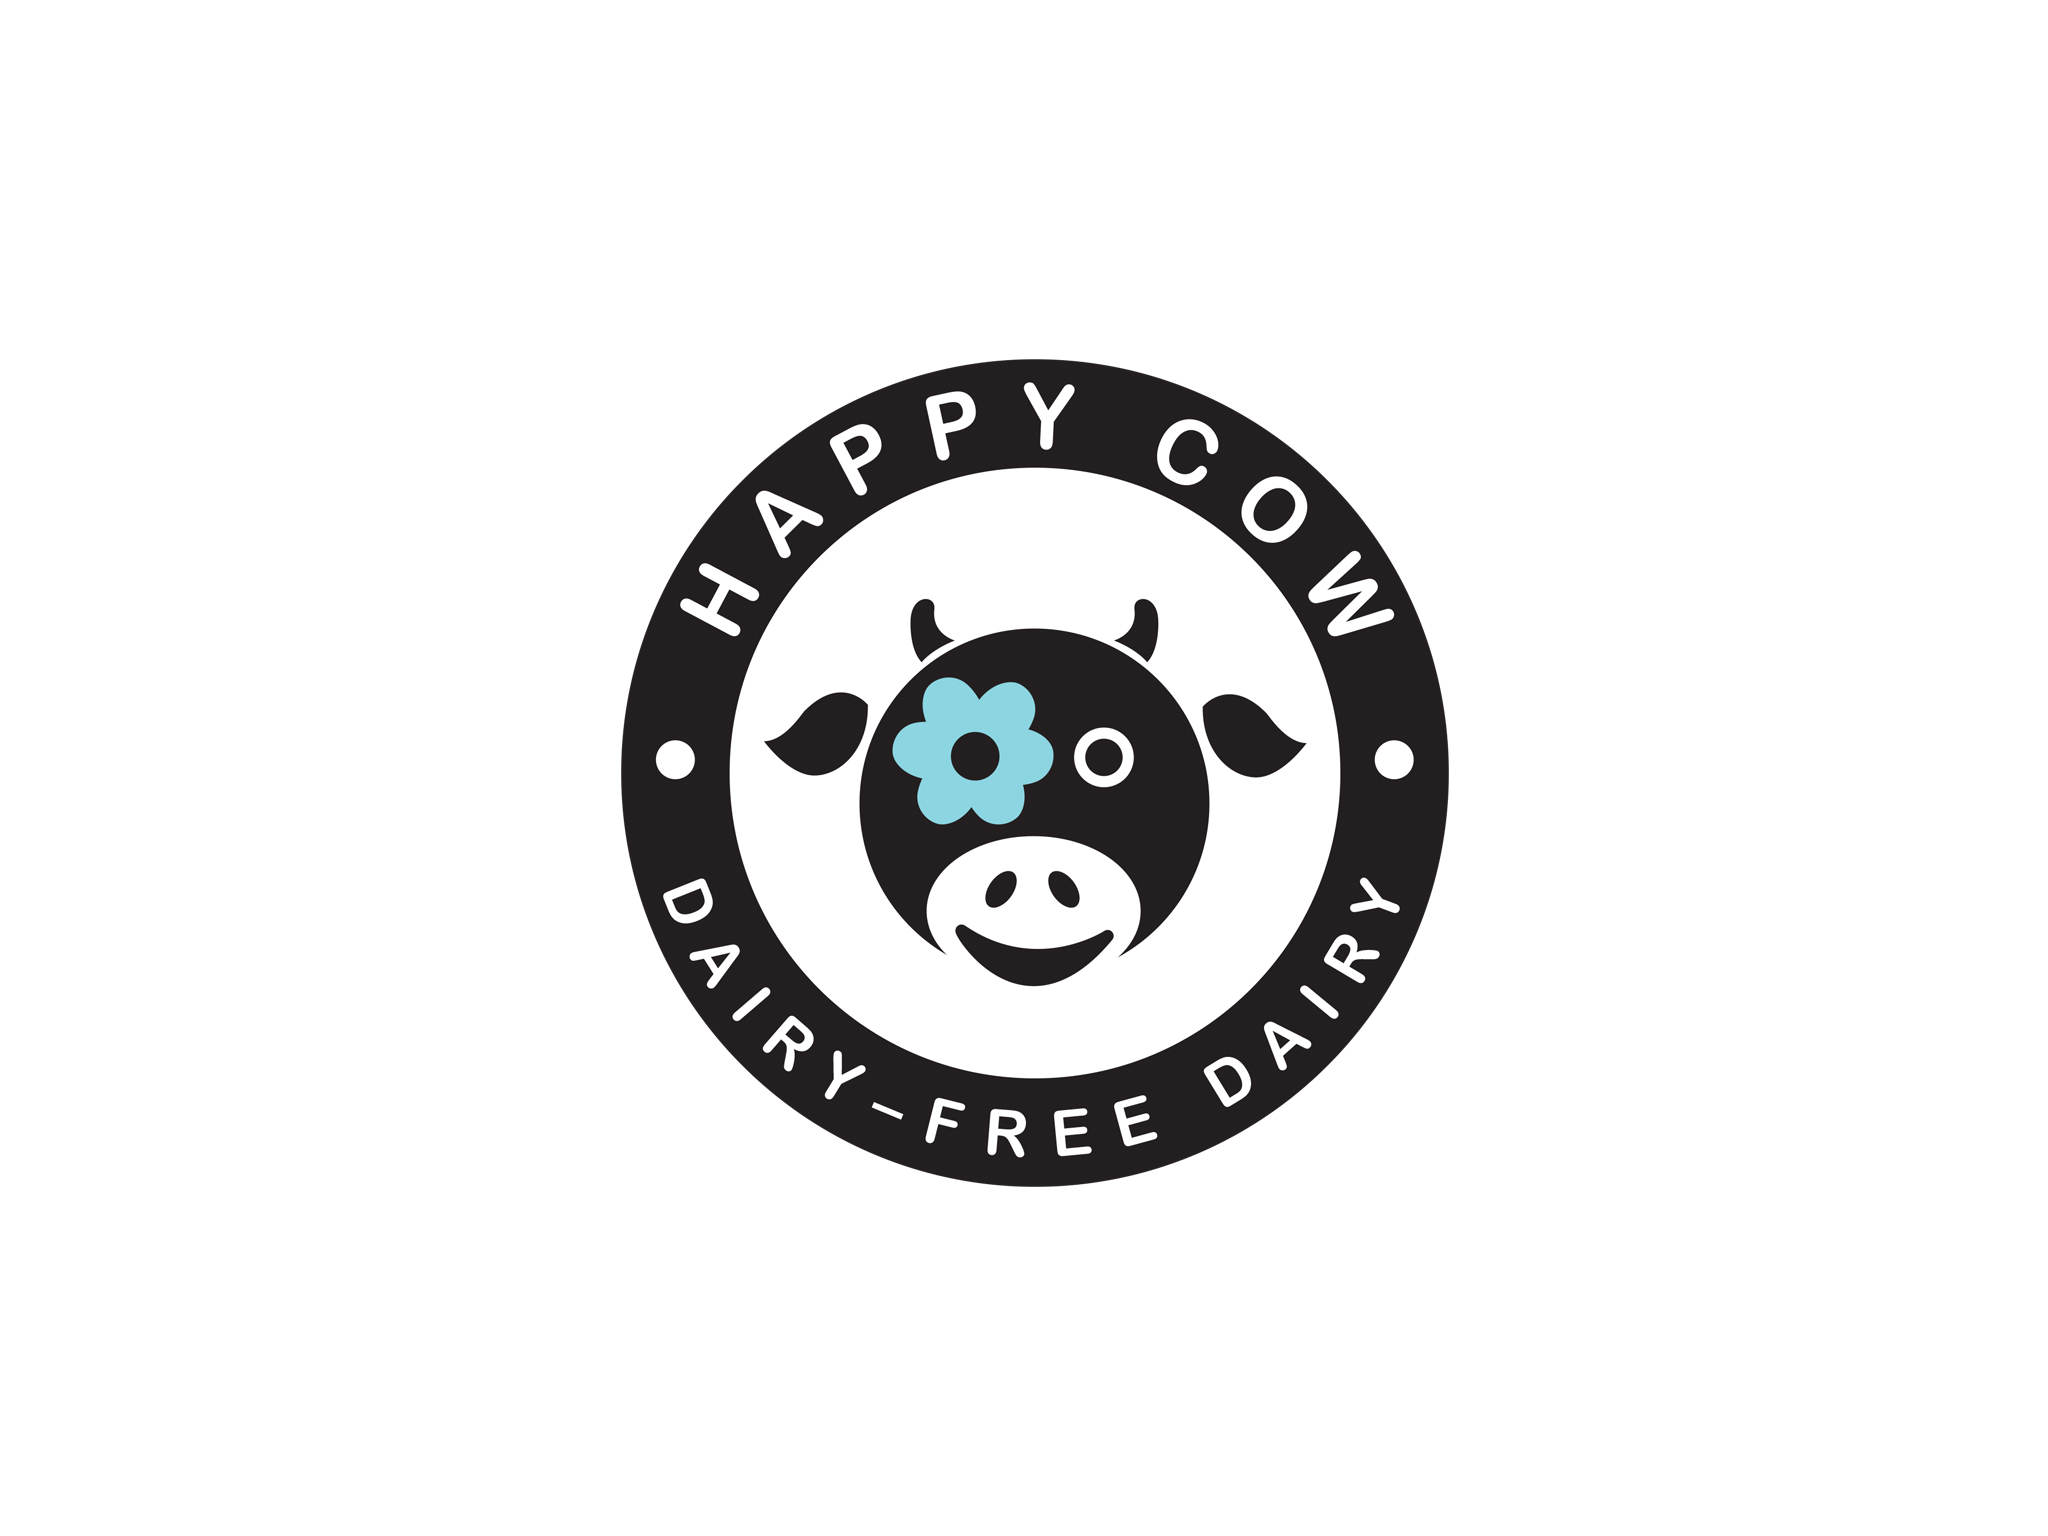 happy cow logo 1.jpg